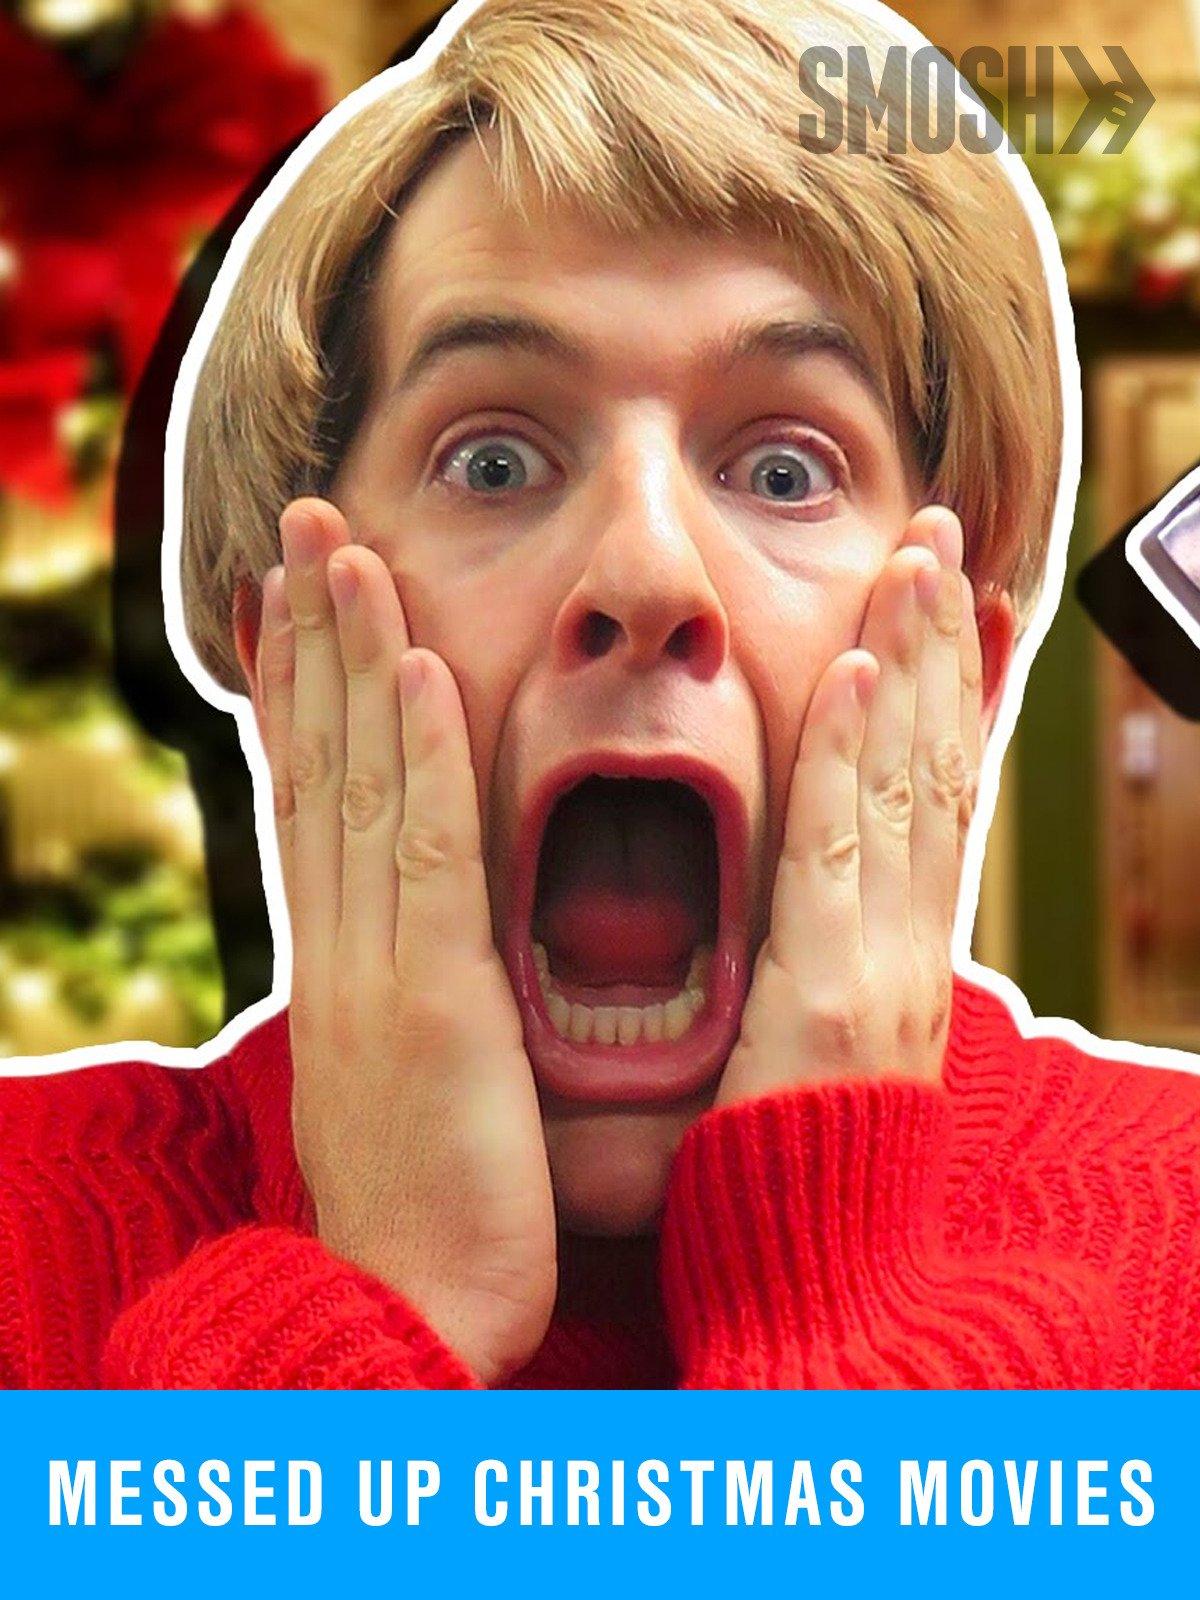 amazoncom clip messed up christmas movies anthony padilla ian hecox ryan todd - Christmas Movies On Amazon Prime